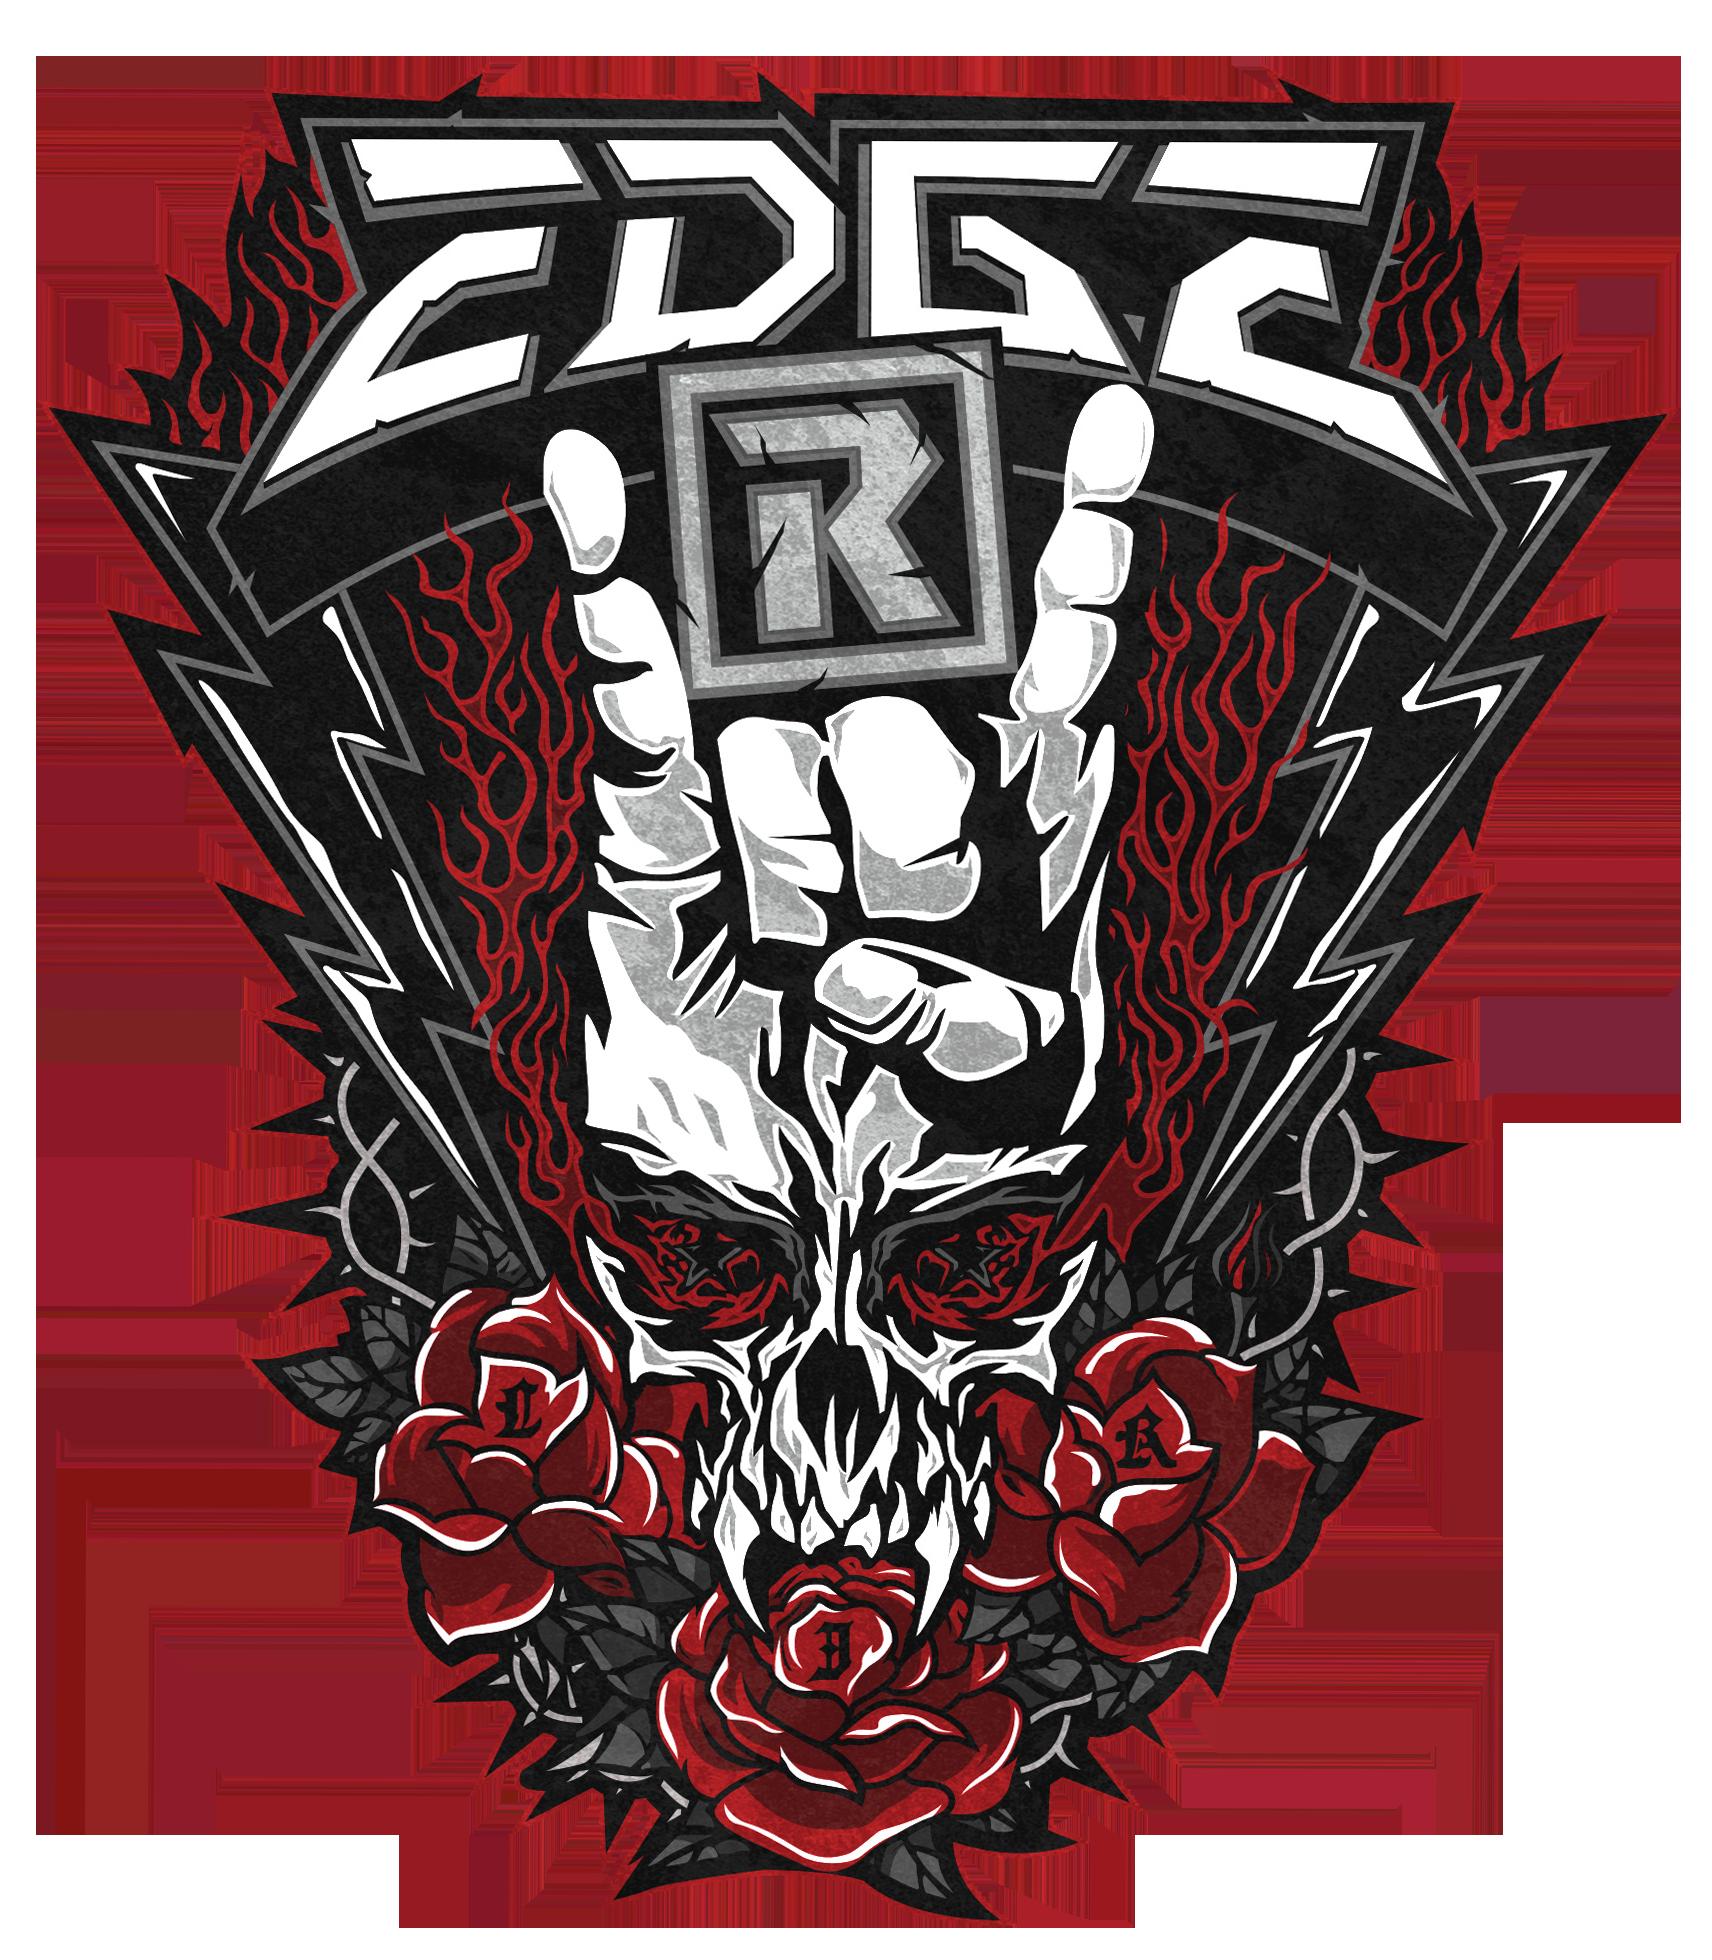 WWE EDGE RETURN LOGO NEW PNG by berkaycan on DeviantArt